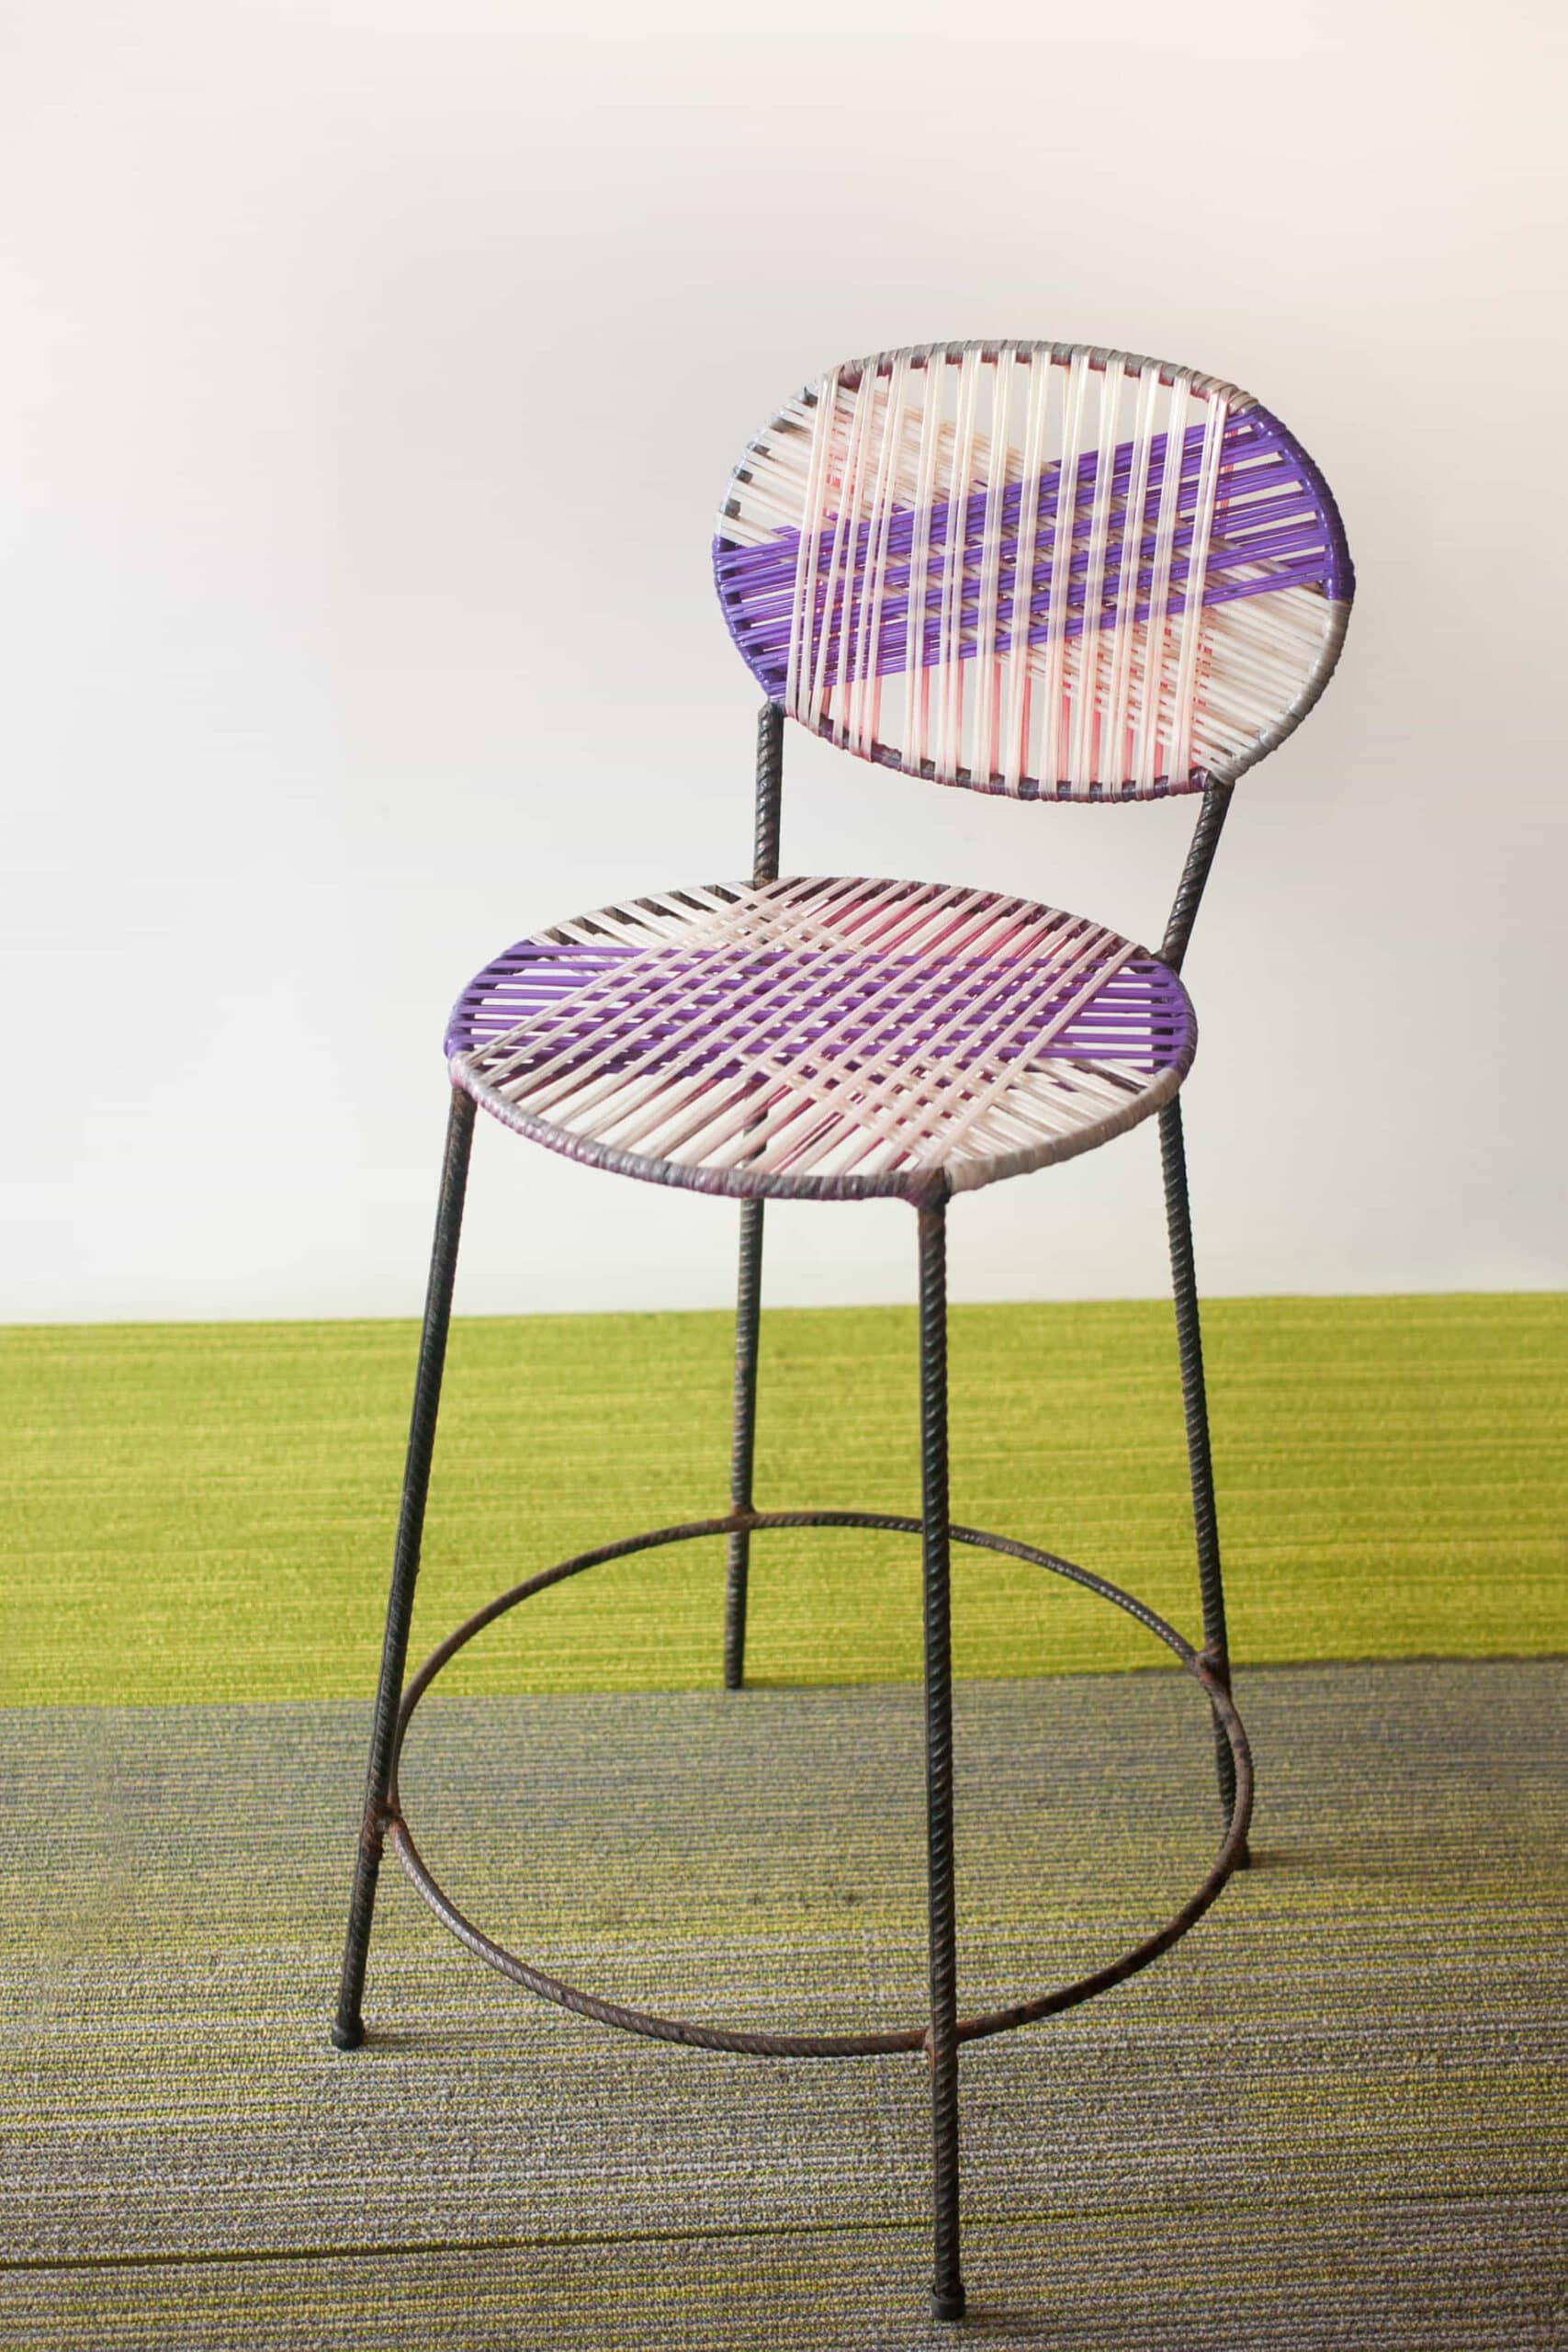 alt=silla restaurada de reciclaje constructivo 4